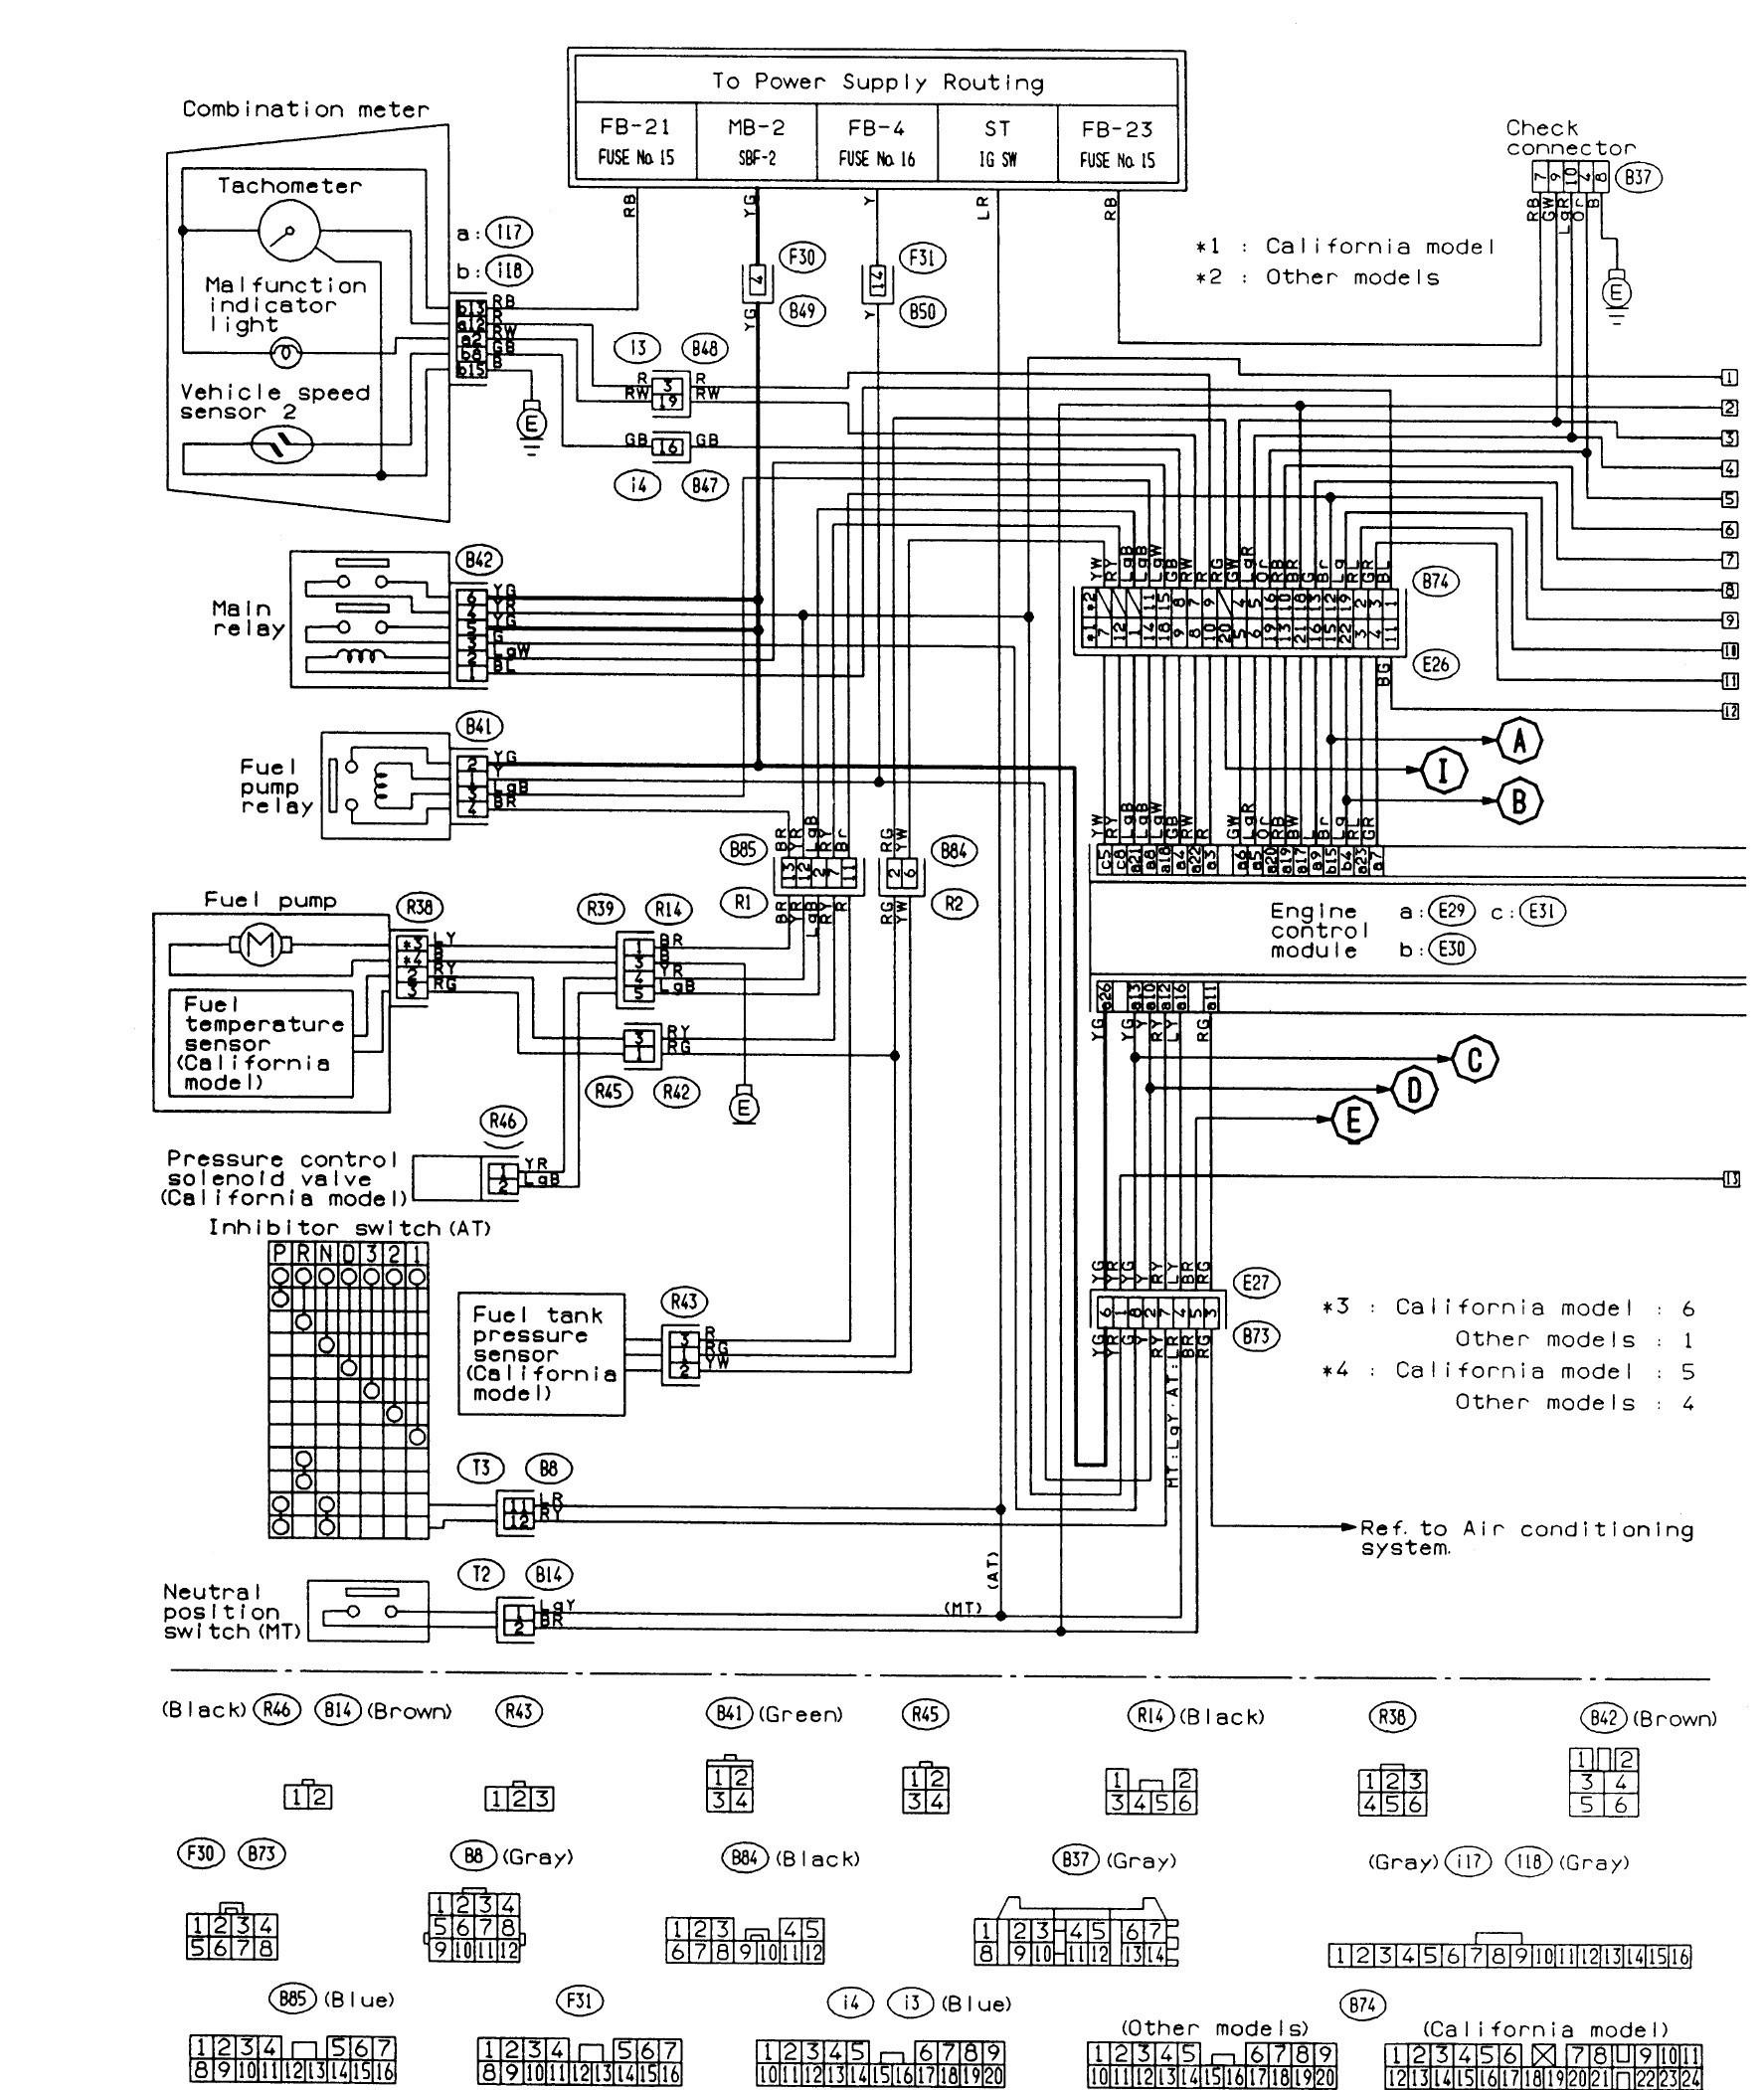 Admirable Rockford P3 12 Wiring Diagram Wiring Diagram Wiring Cloud Hemtshollocom